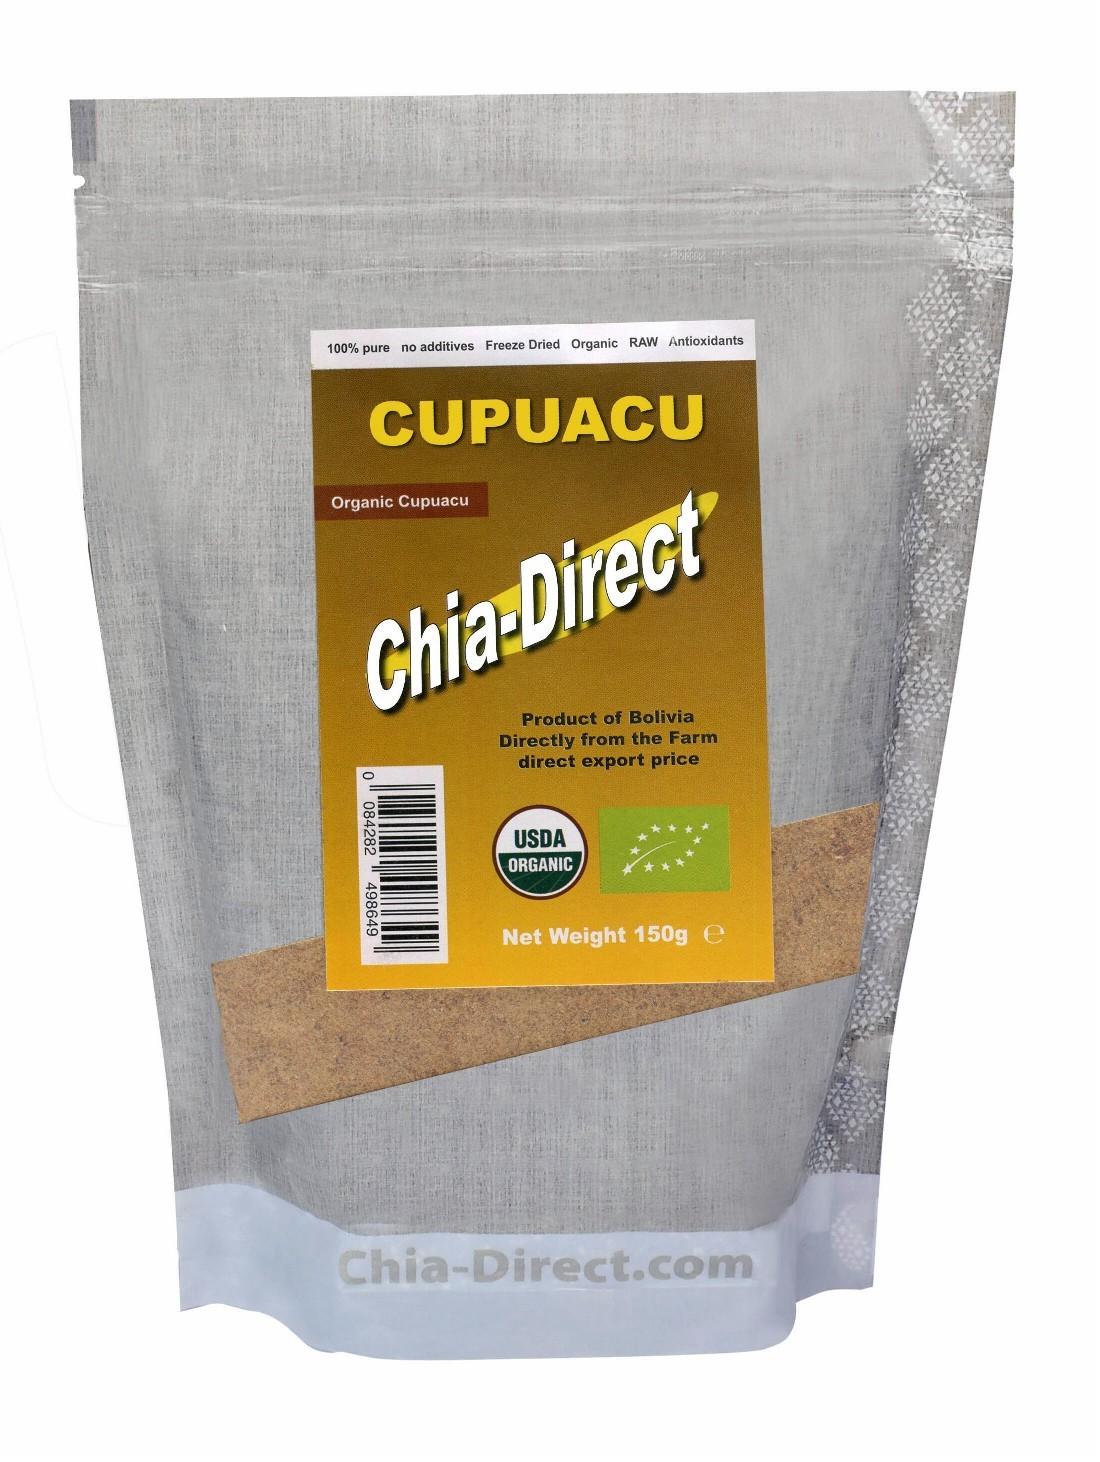 5,3lbs organic cupuacu powder freeze dried